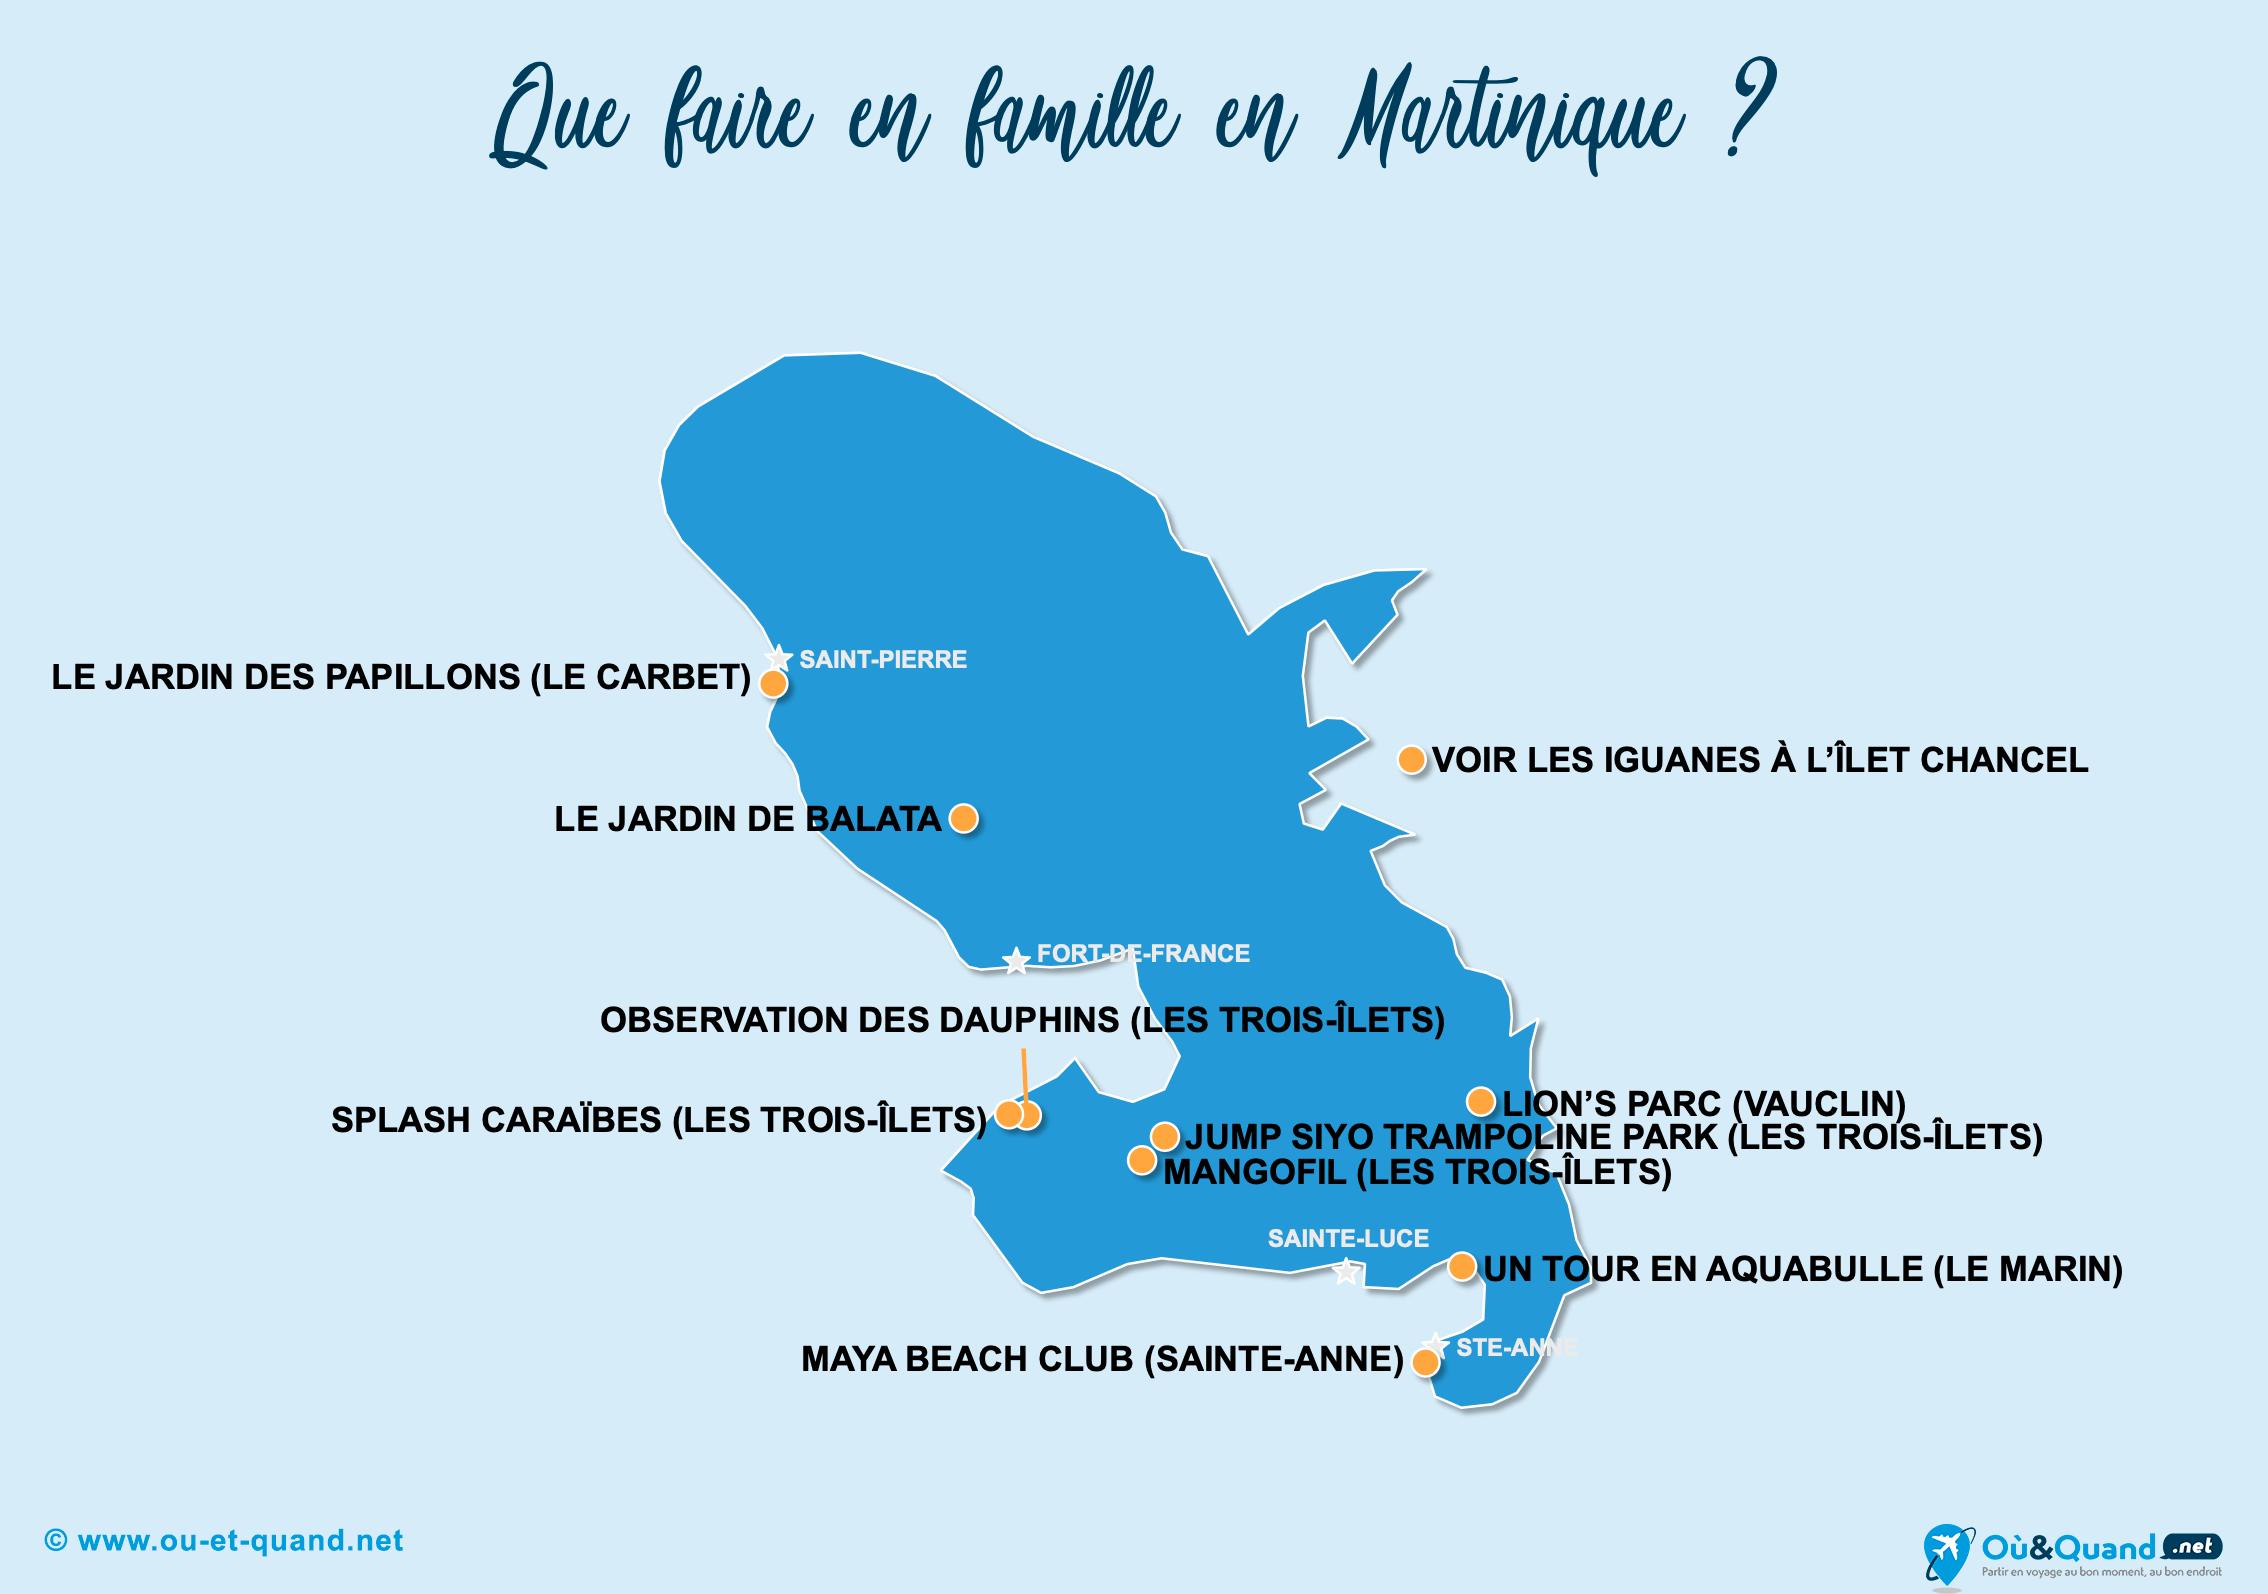 Carte Martinique : La Martinique en famille